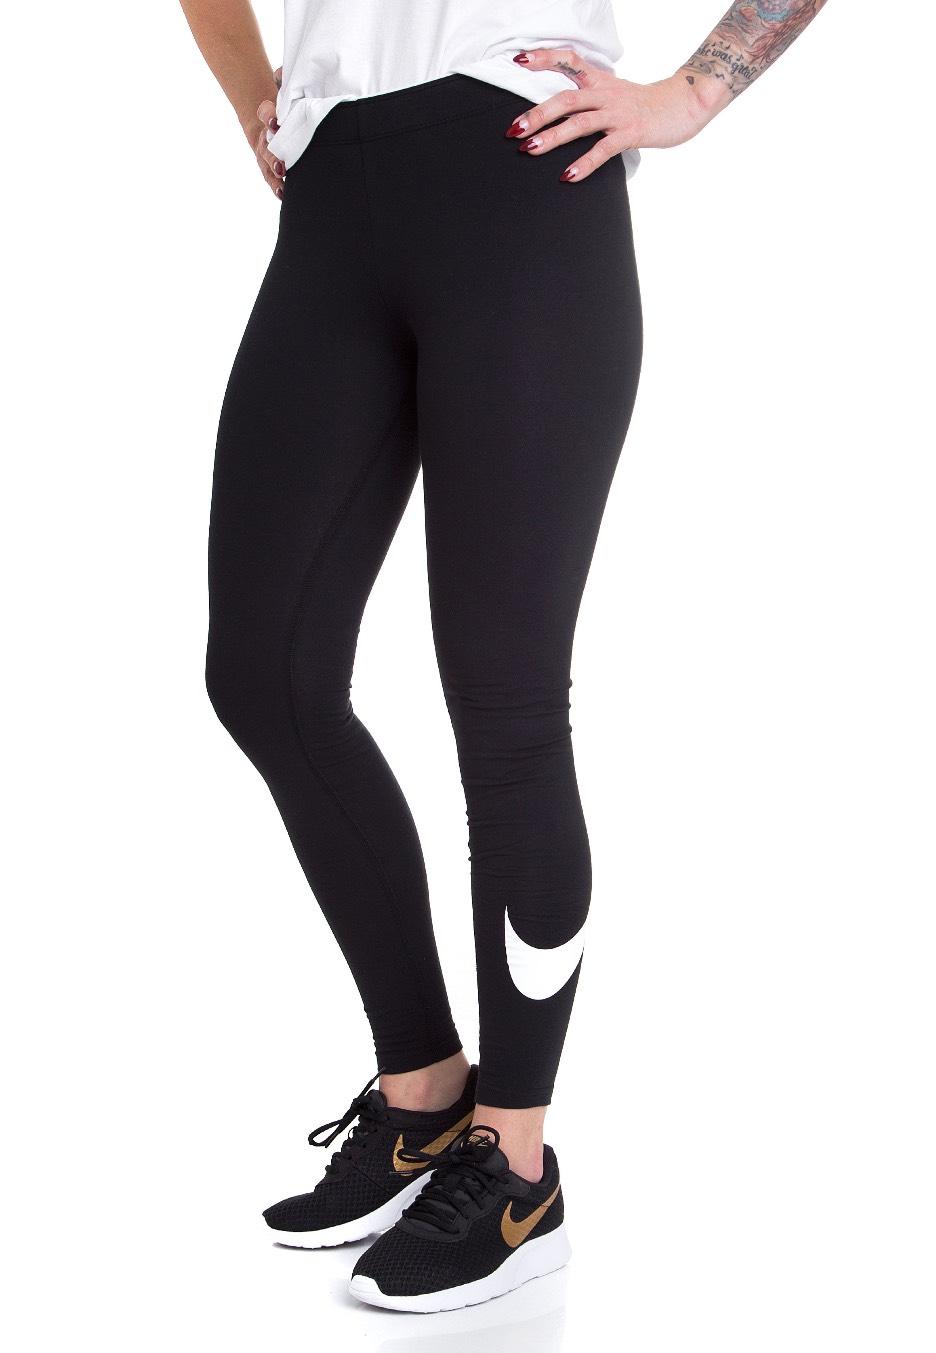 c9c400b31de68 Nike - Club Logo 2 Black/White - Leggings - Streetwear Shop - Impericon.com  UK